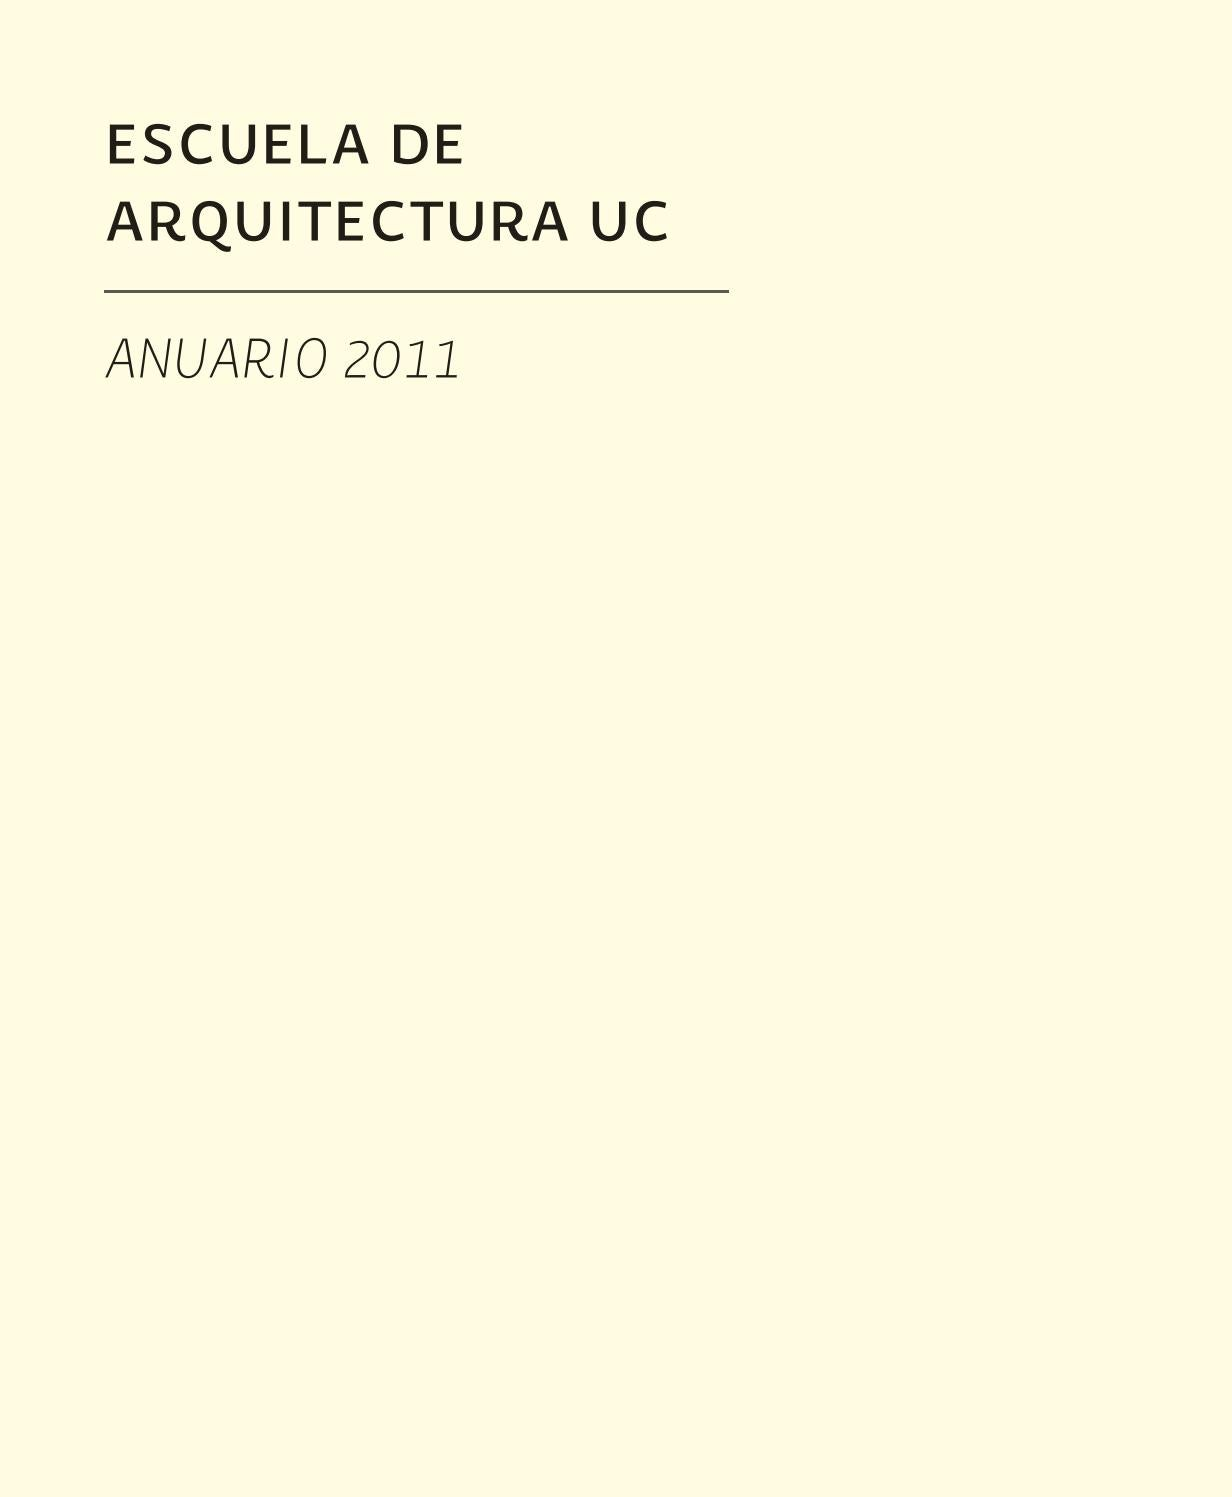 Anuario Arquitectura UC 2011 by Arquitectura UC - issuu